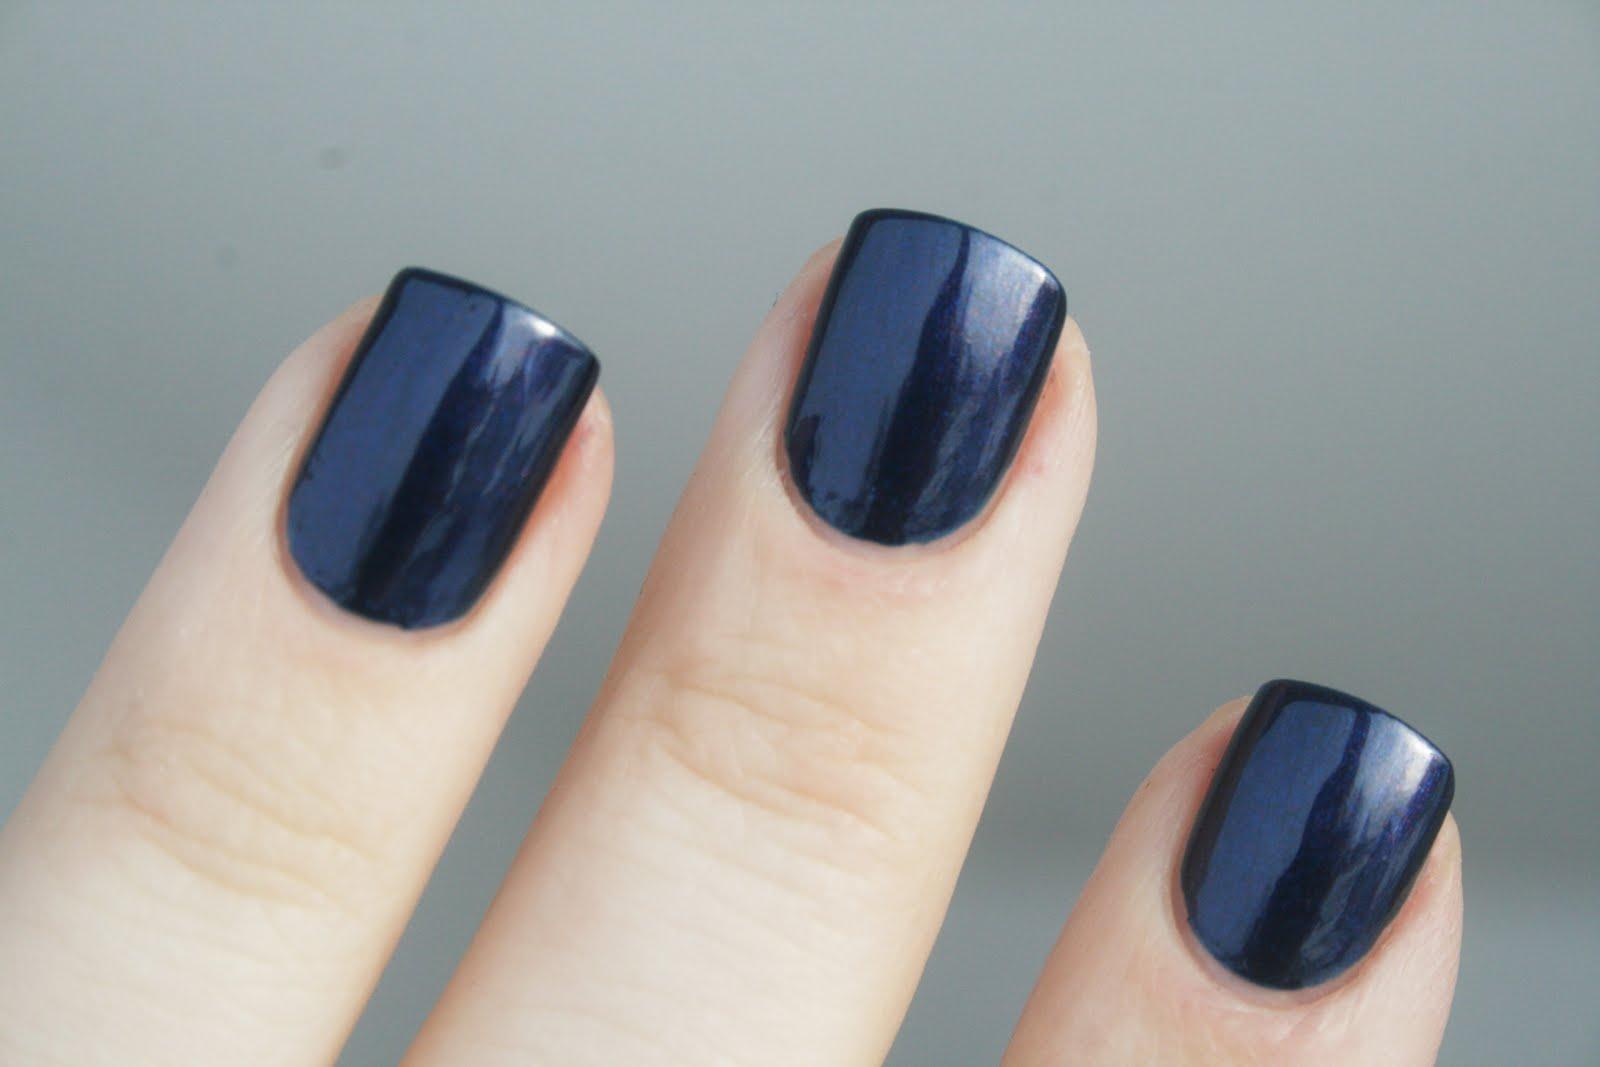 Nails by Catharina: I love dark, short nails